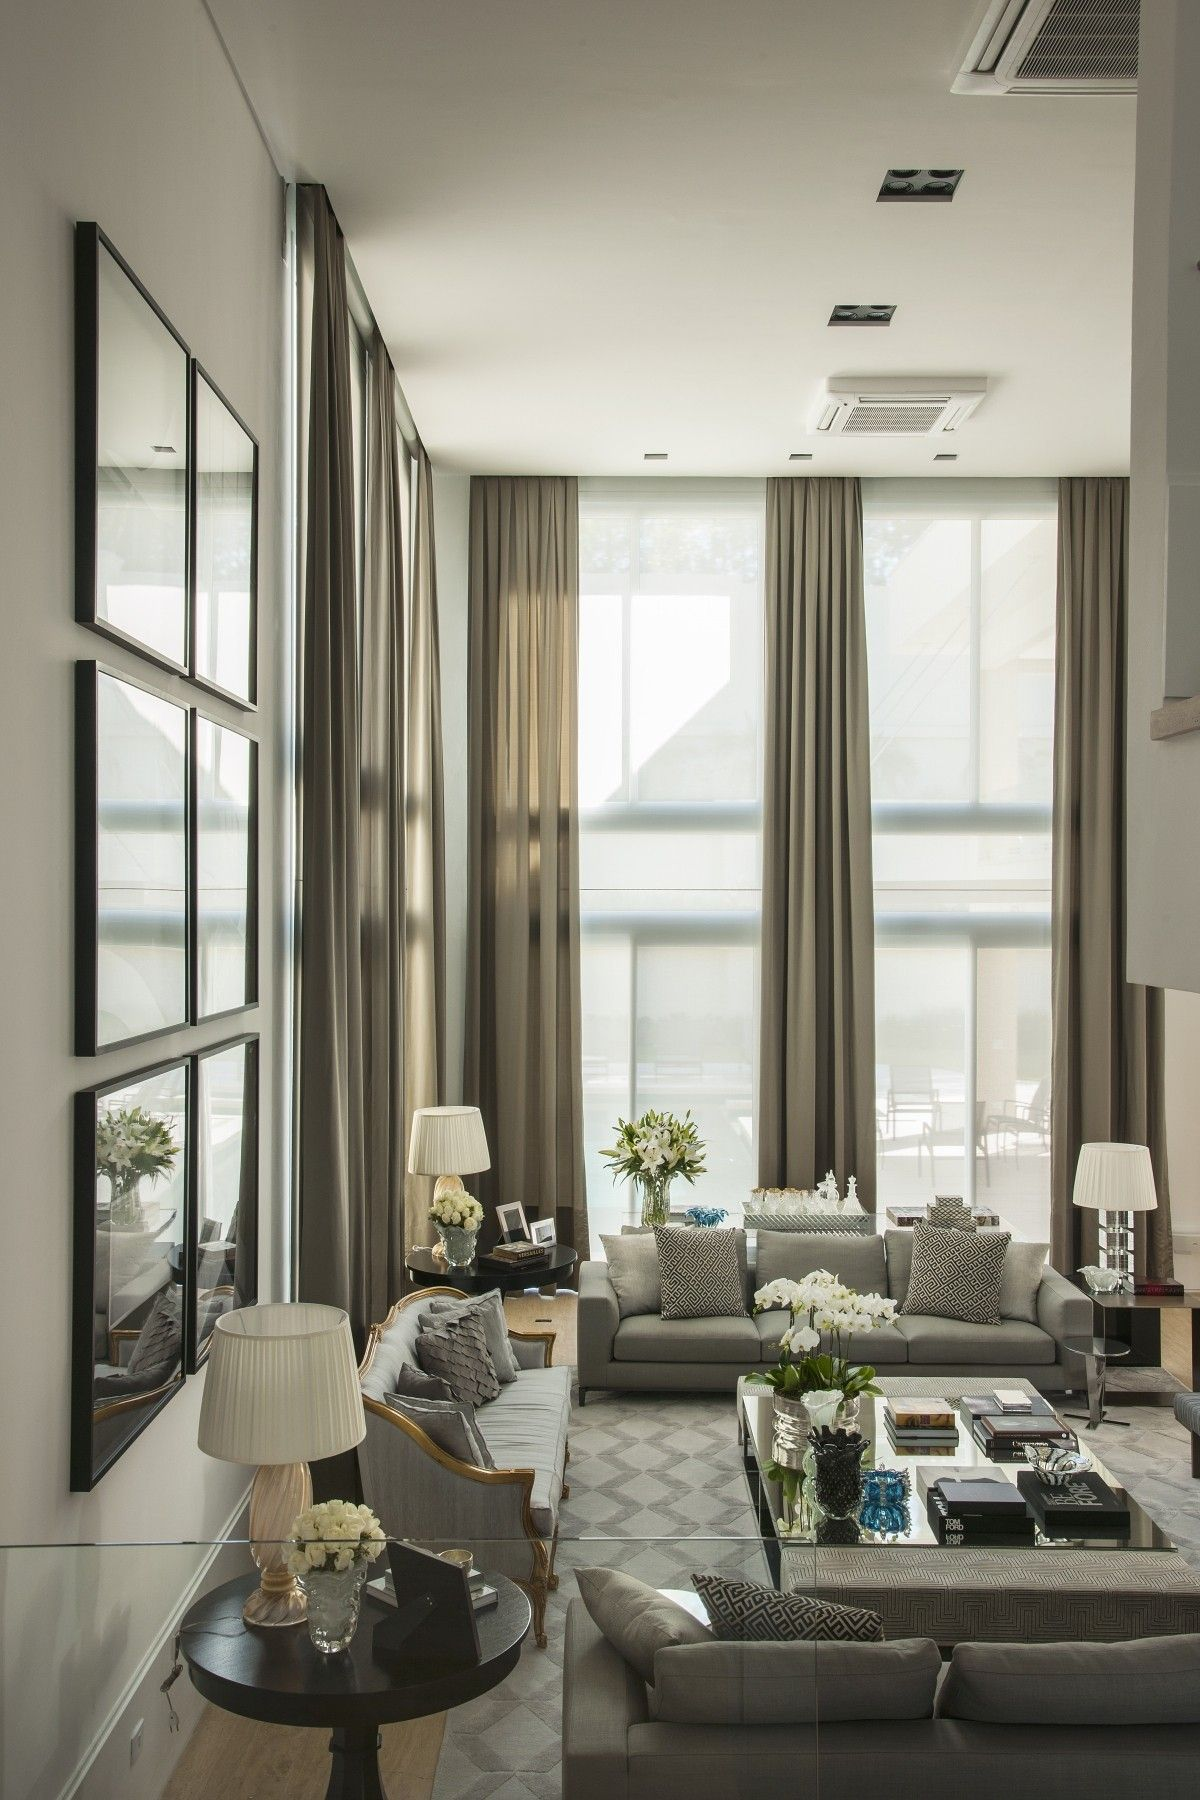 35 Most Popular Transitional Living Rooms Design Ideas Transitional Living Room Design High Ceiling Living Room Elegant Living Room #transitional #living #room #designs